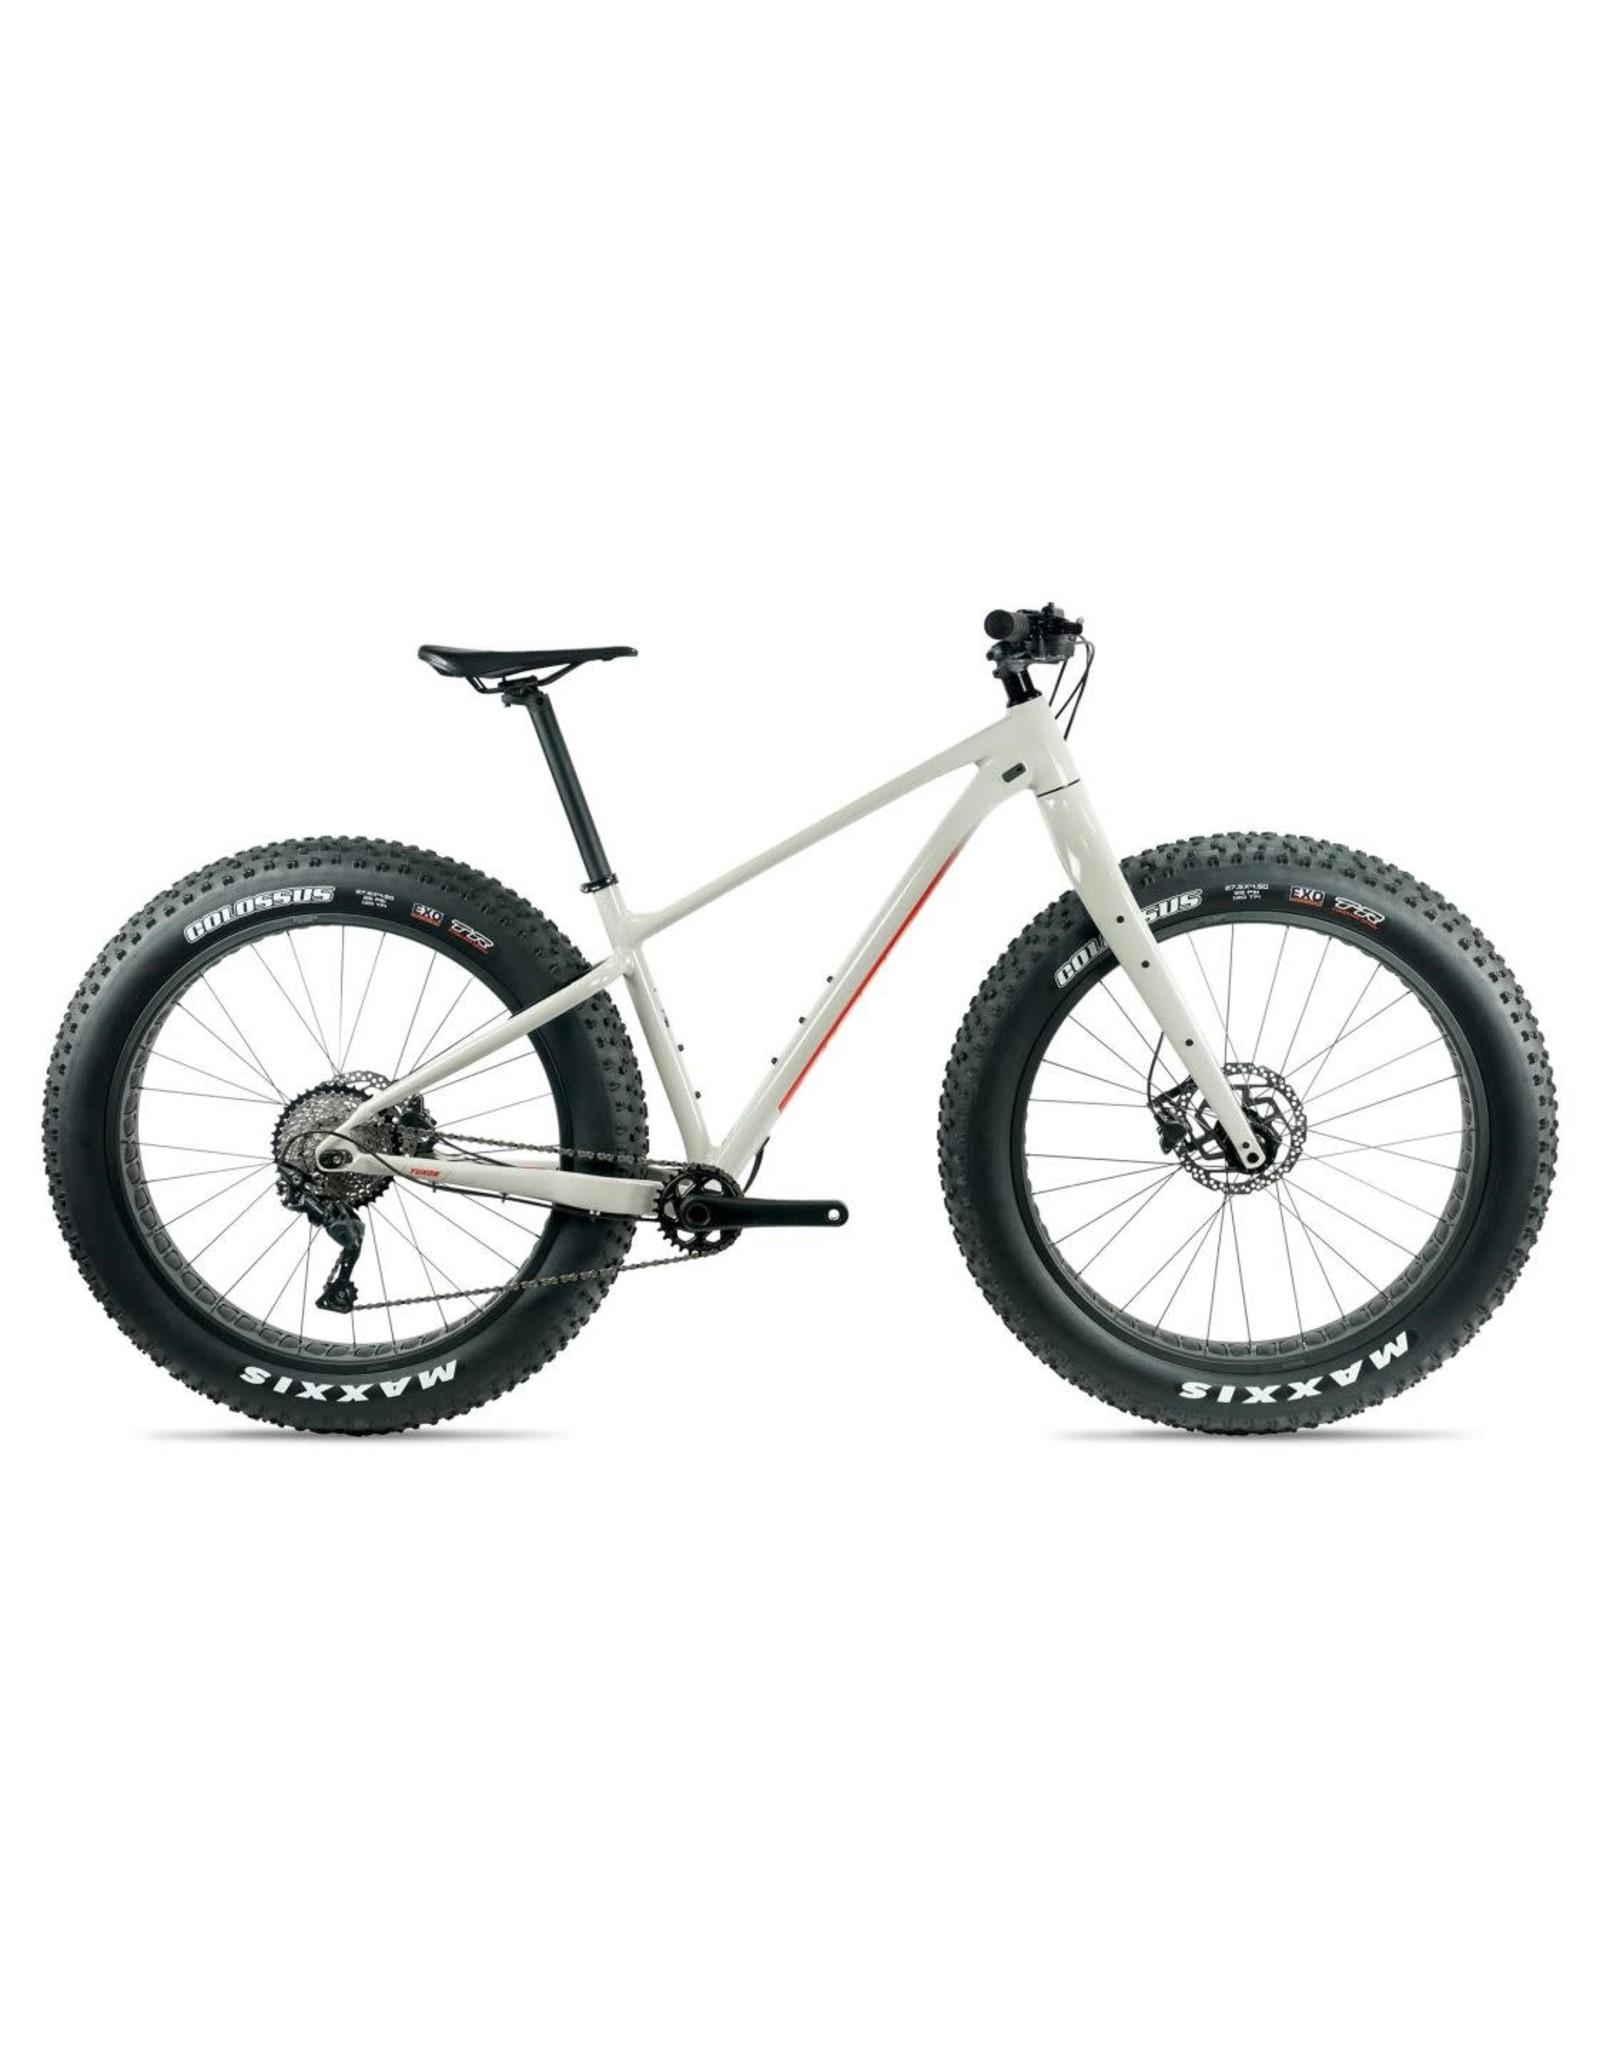 GIANT Yukon 2 Tan Fat Bike